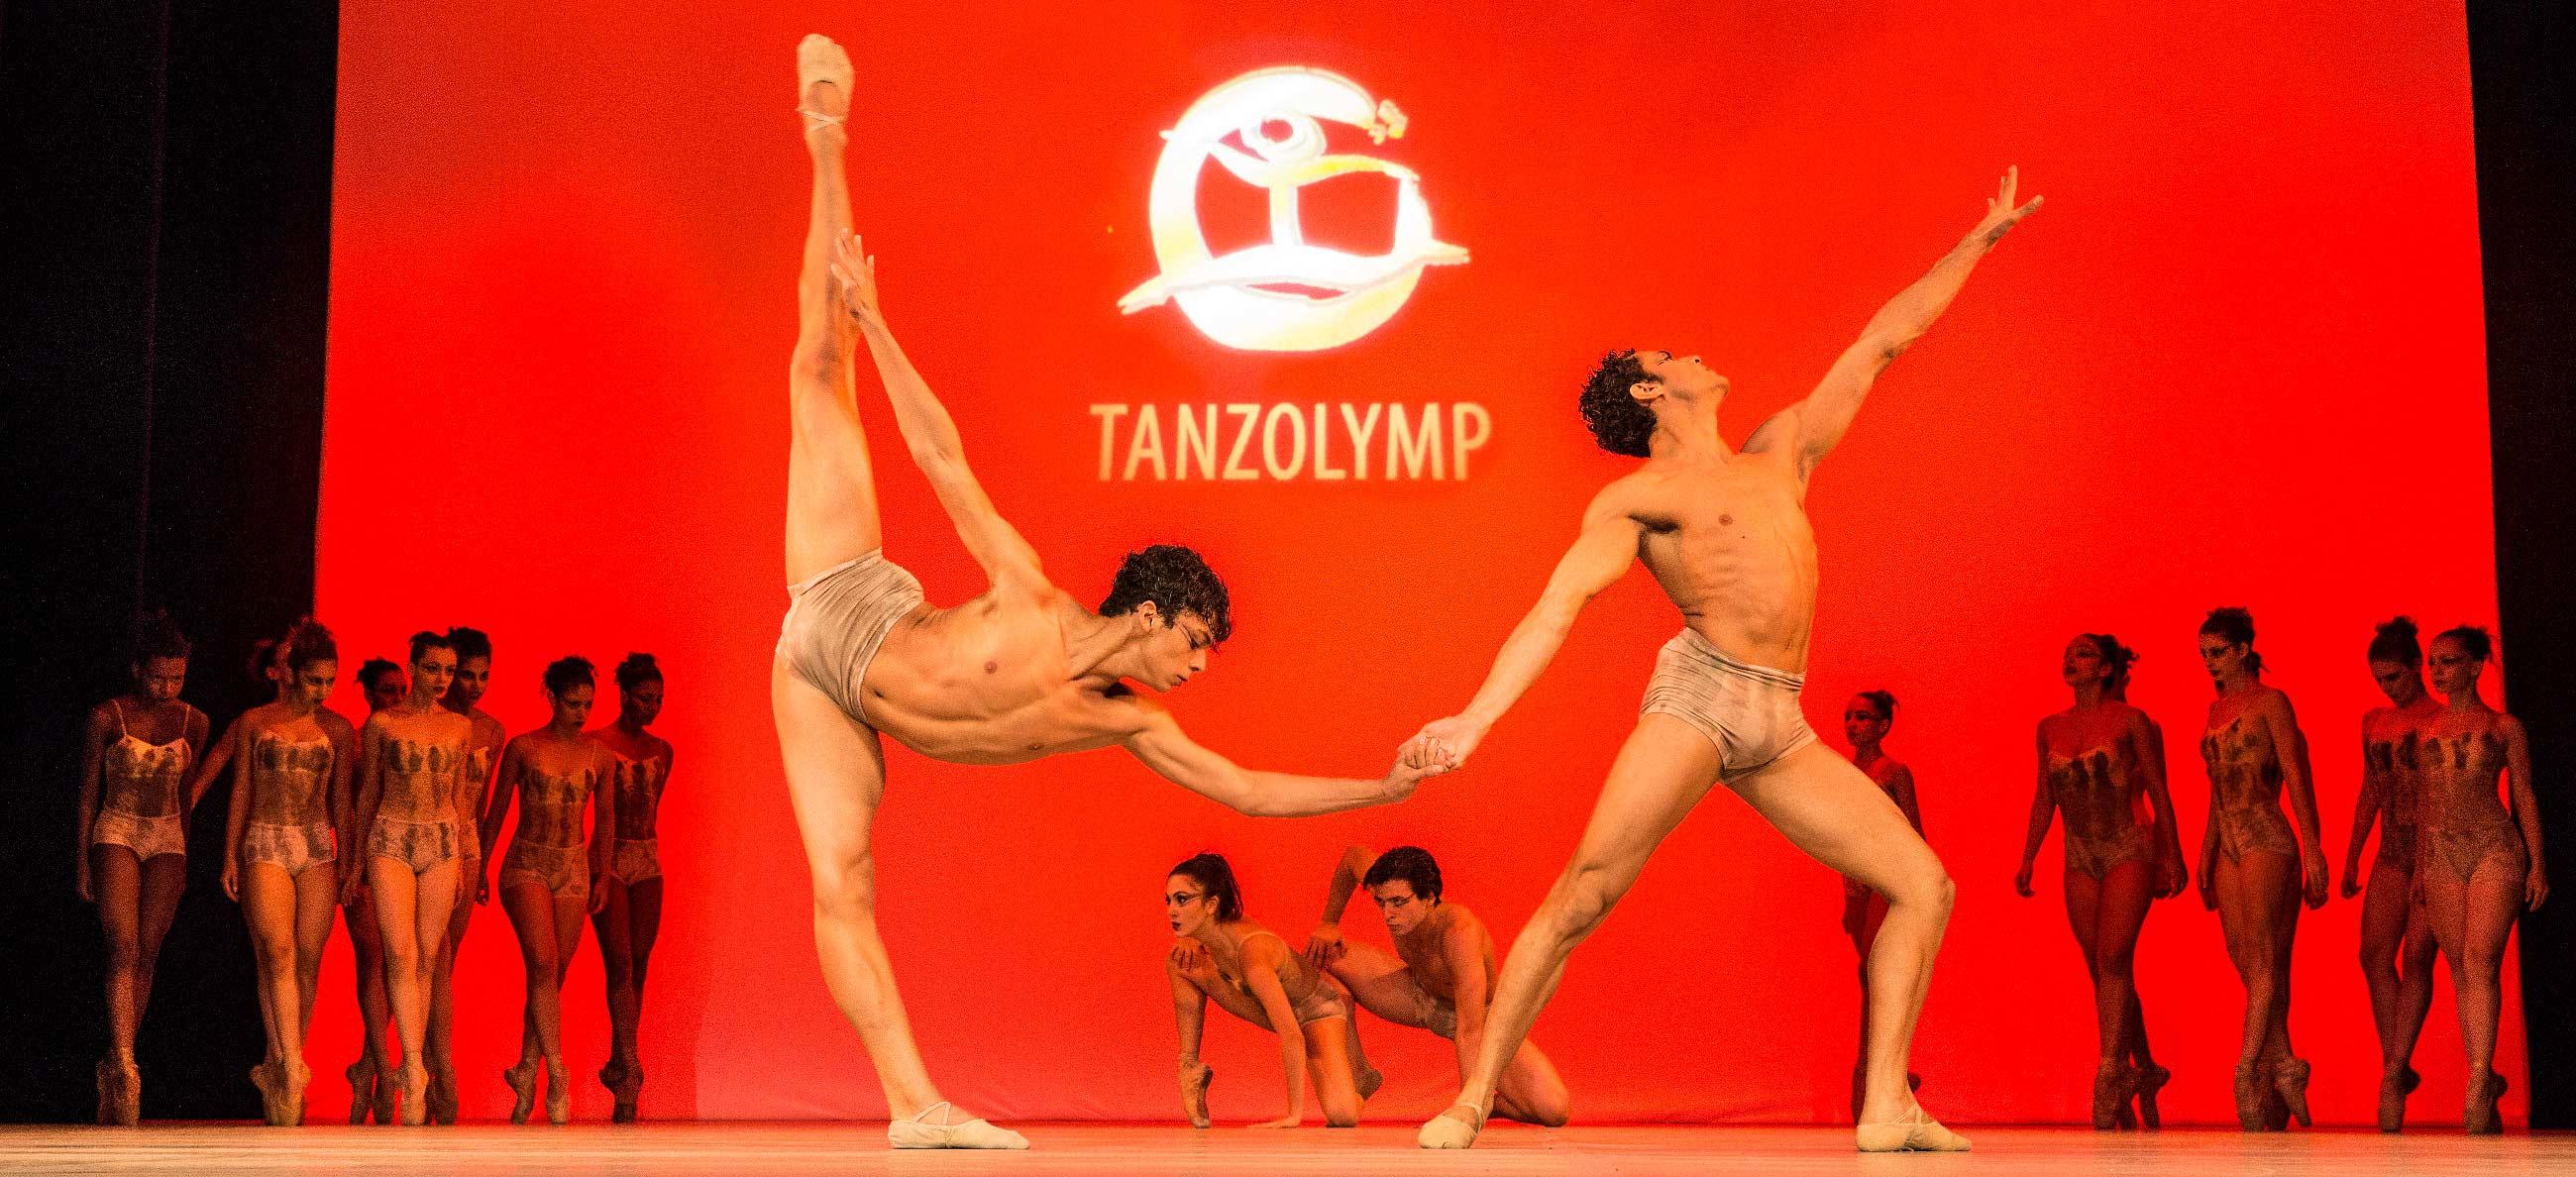 Tanzolymp